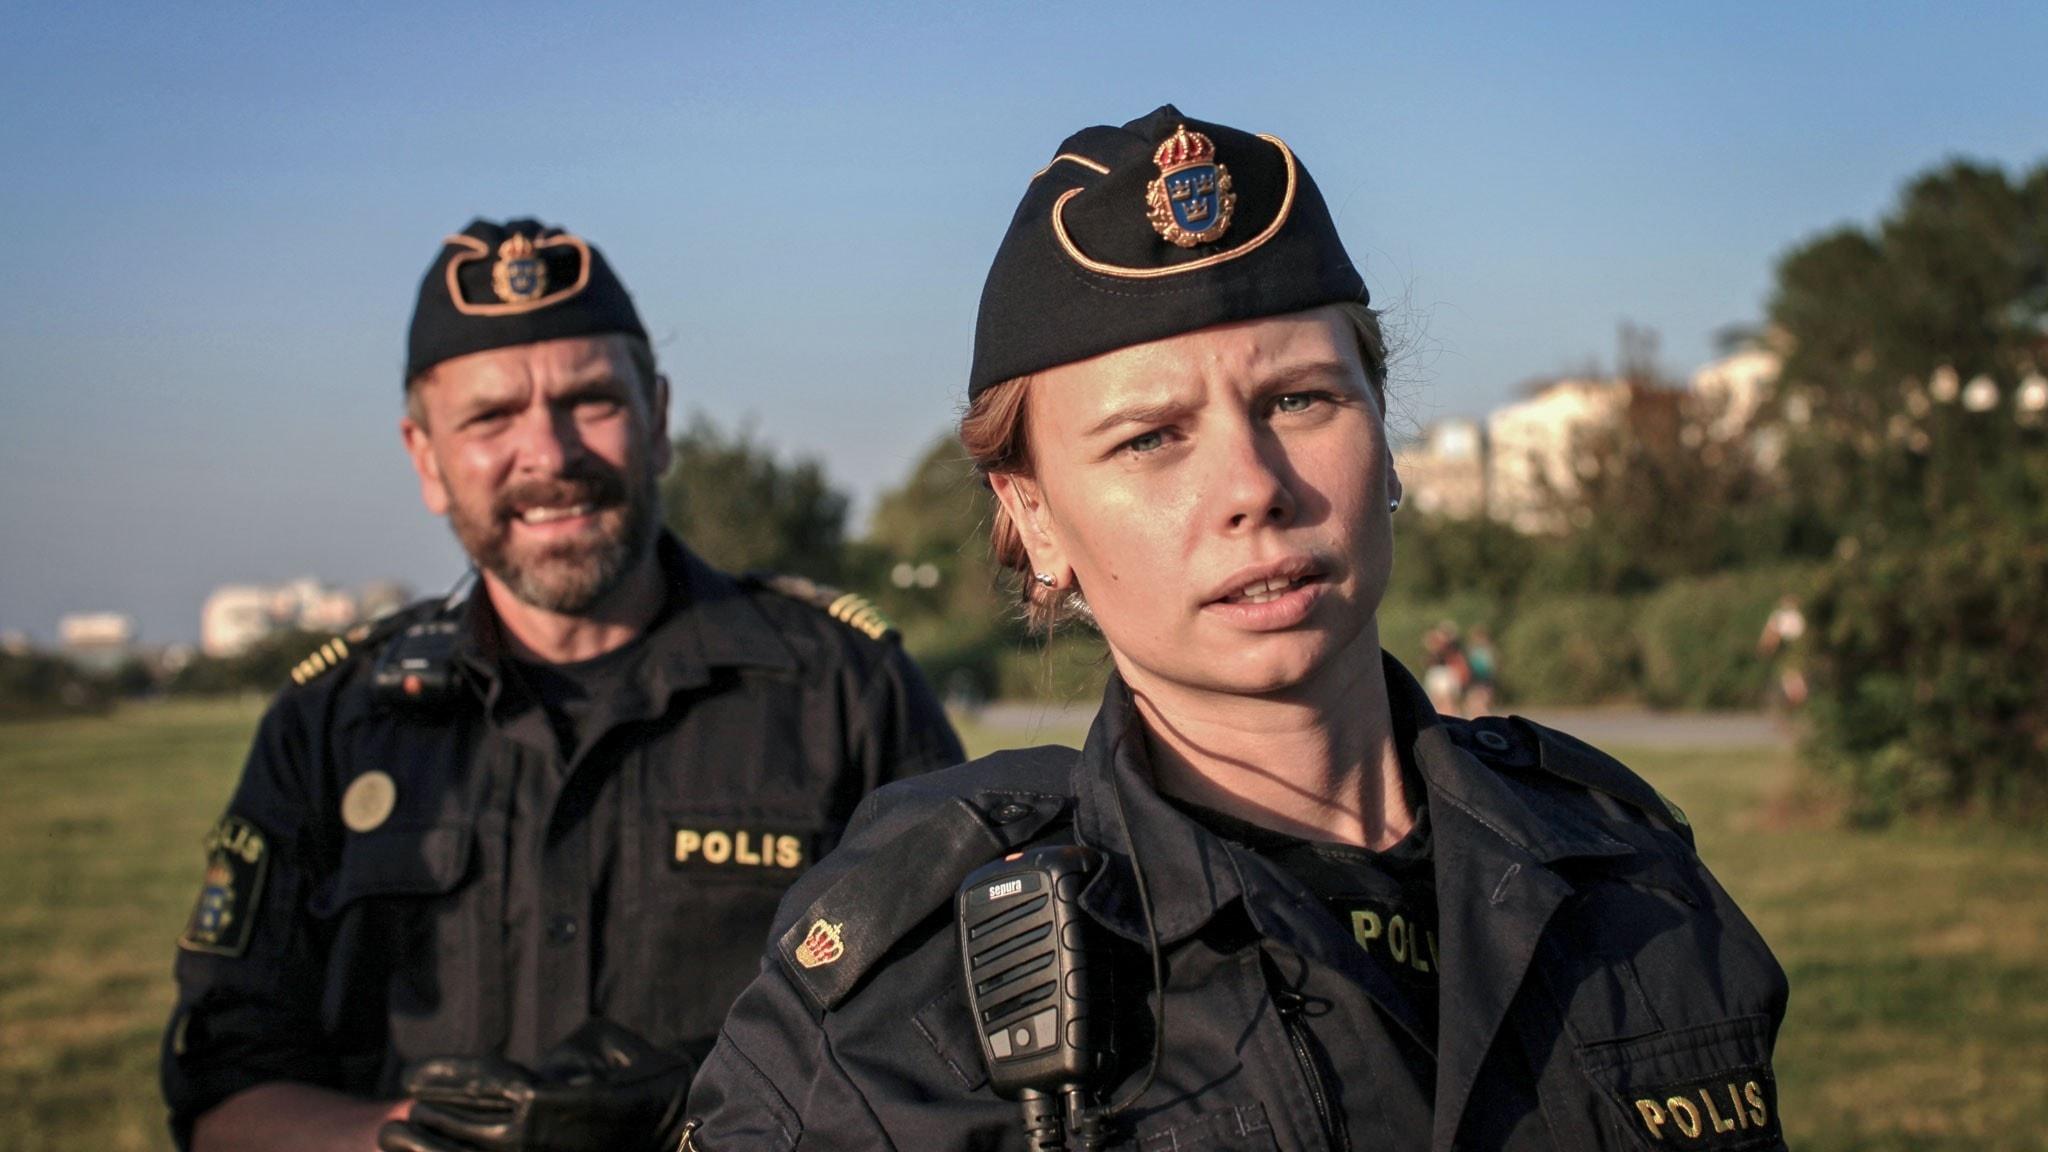 Unik tonträff i SVT:s nya dramaserie Tunna blå linjen